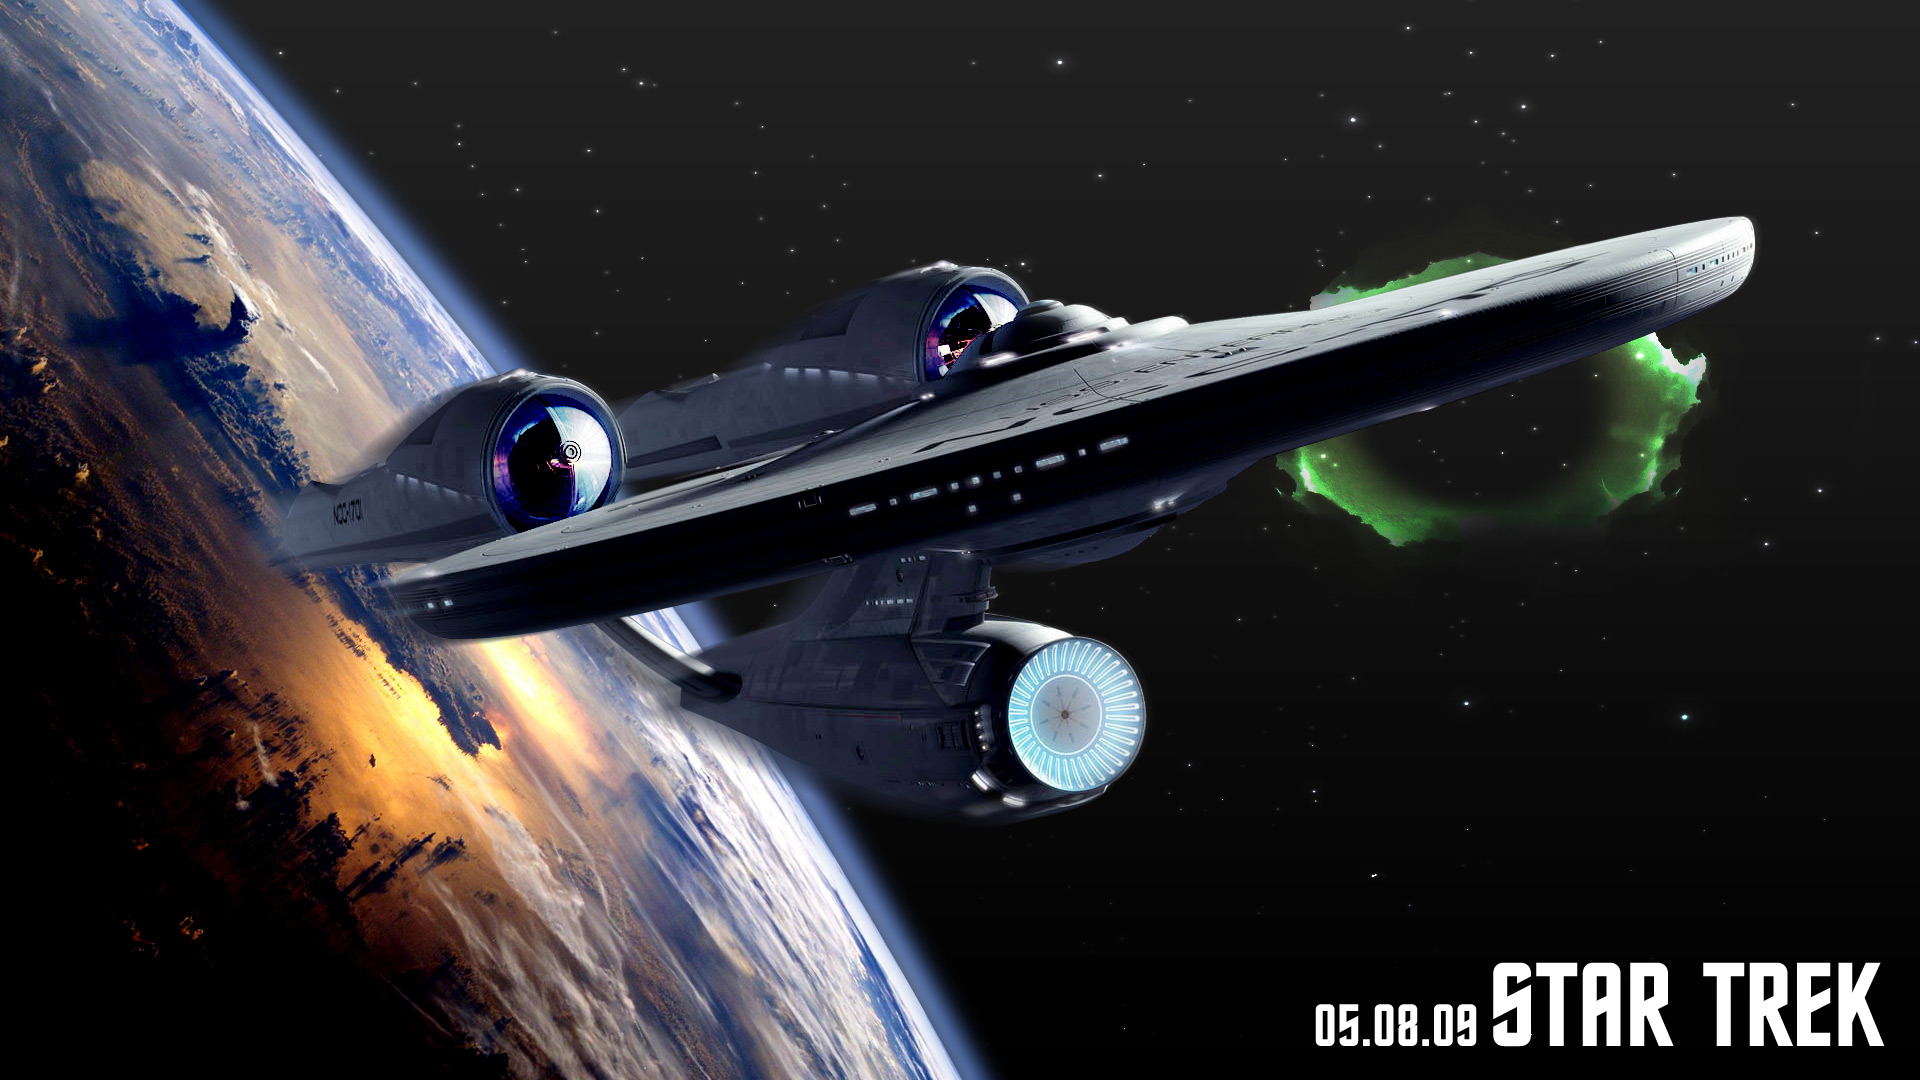 Star Trek Wallpaper HD 19201080 BlogNOBON 1920x1080